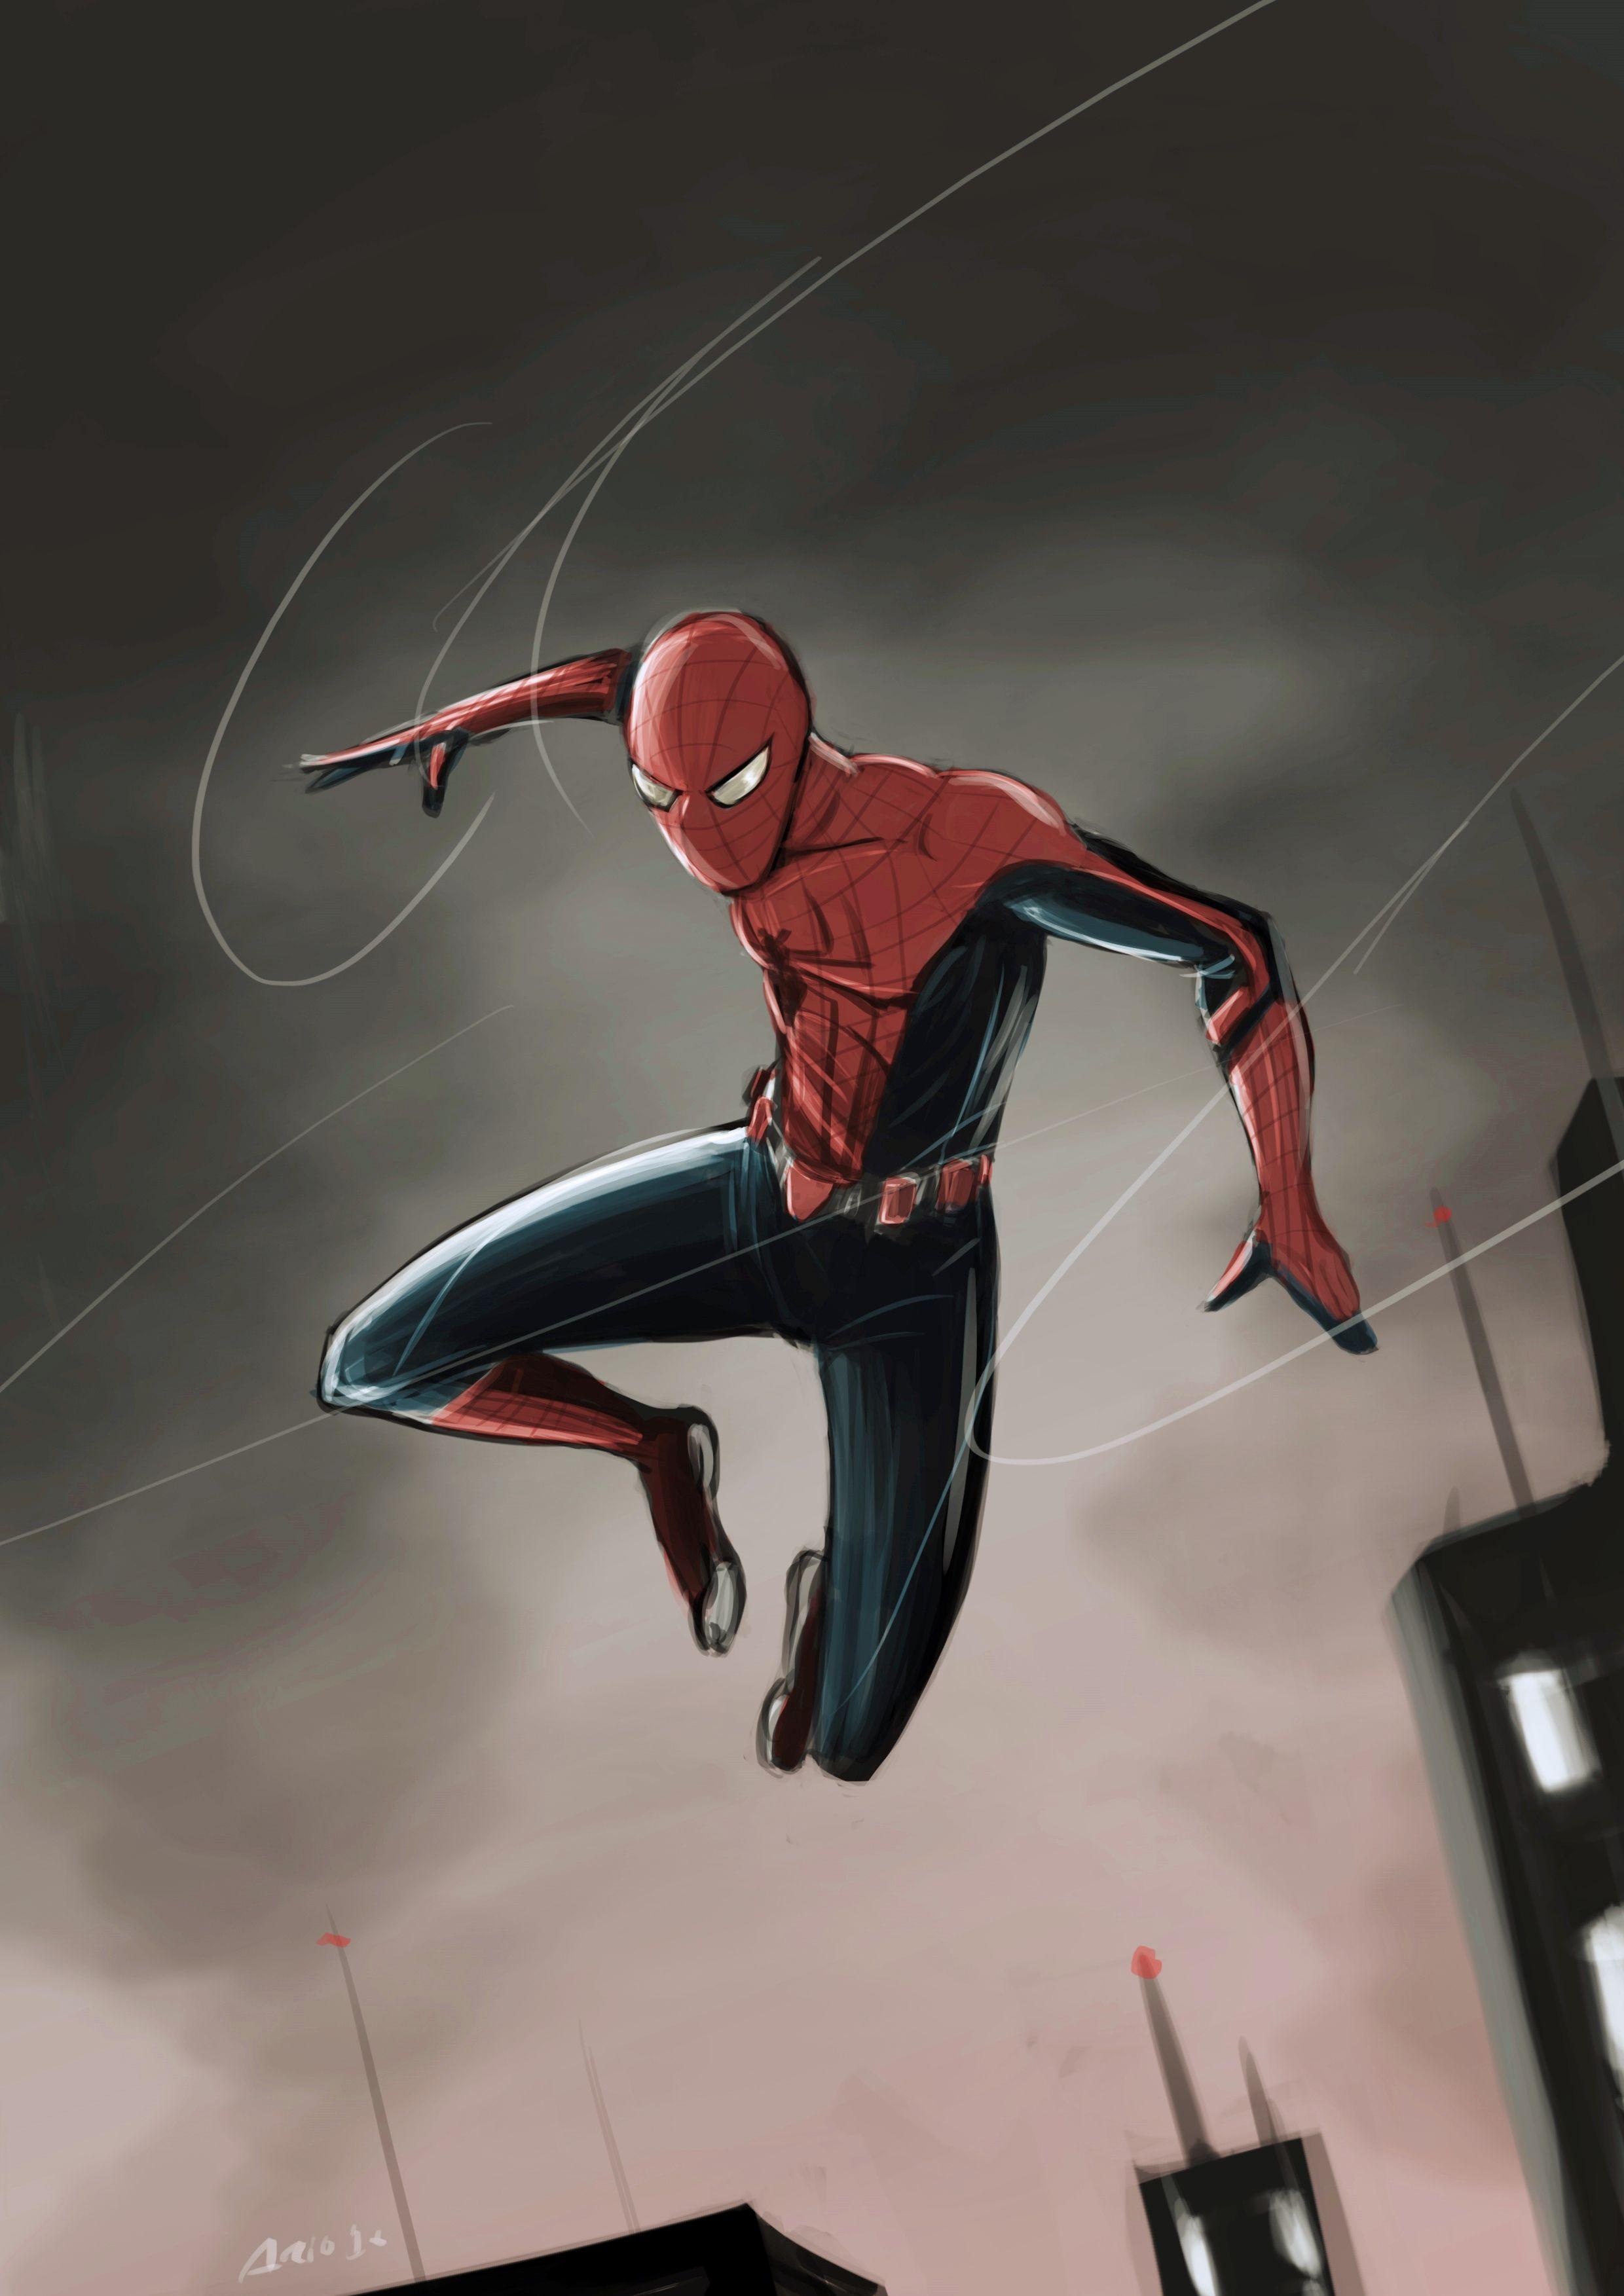 the amazing spiderman | Amazing spiderman, Spectacular ...